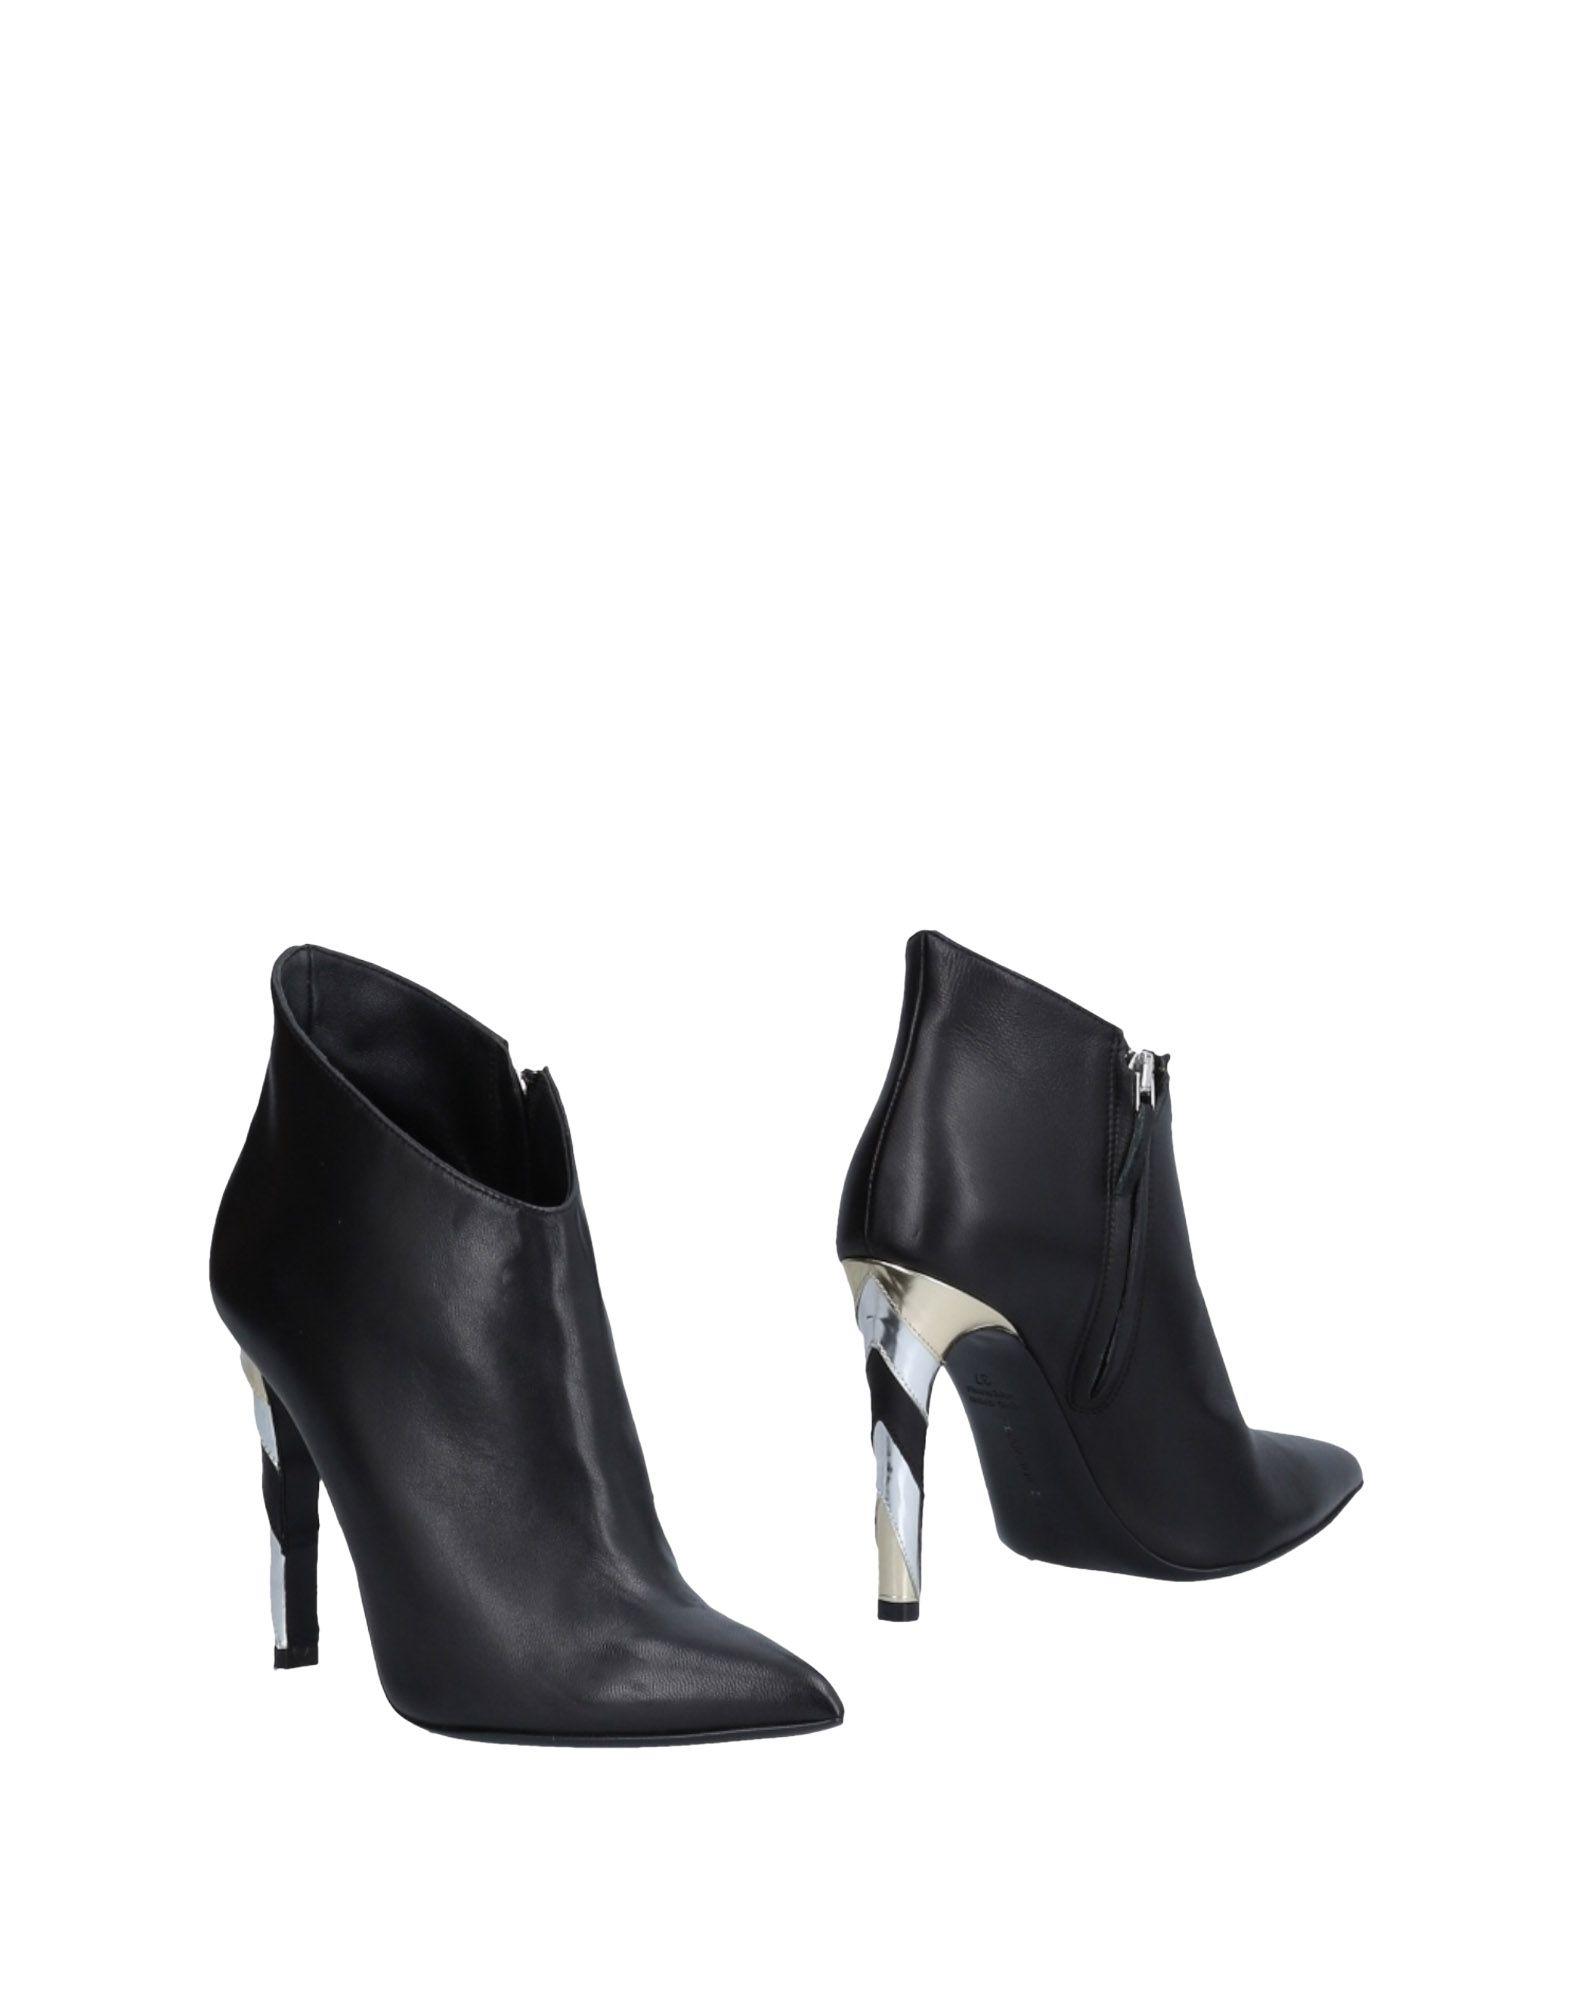 CHARLINE DE LUCA Ankle Boot in Black